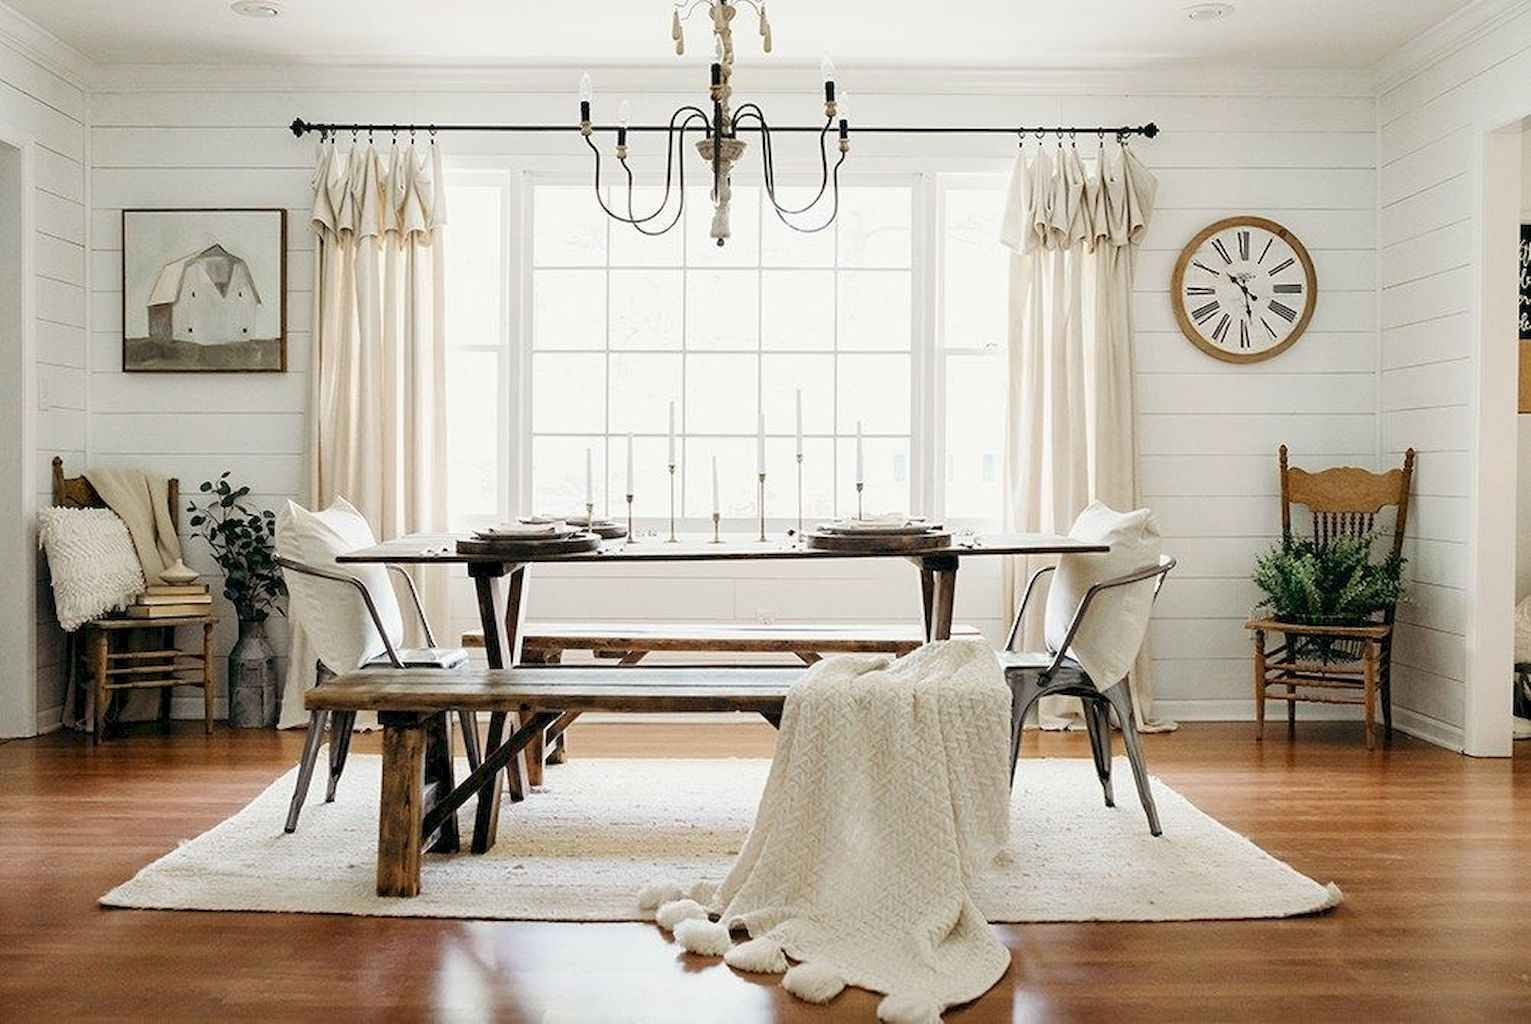 85 Beautiful Farmhouse Living Room Curtains Decor Ideas ... on Farmhouse Dining Room Curtain Ideas  id=54593